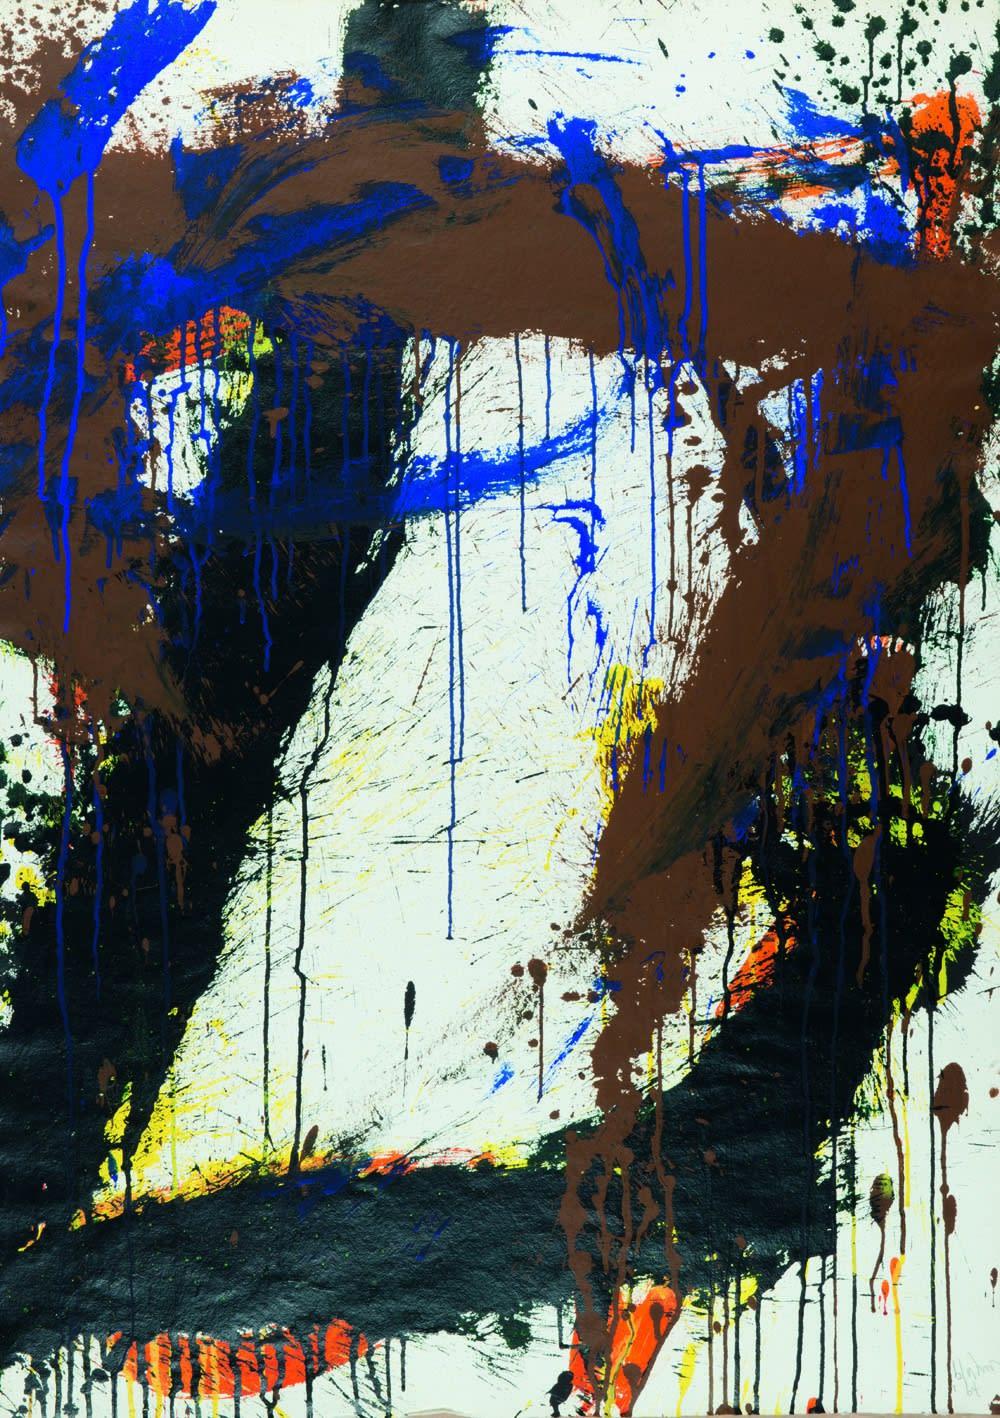 Spotlight: Artist of the Month, Norman Bluhm